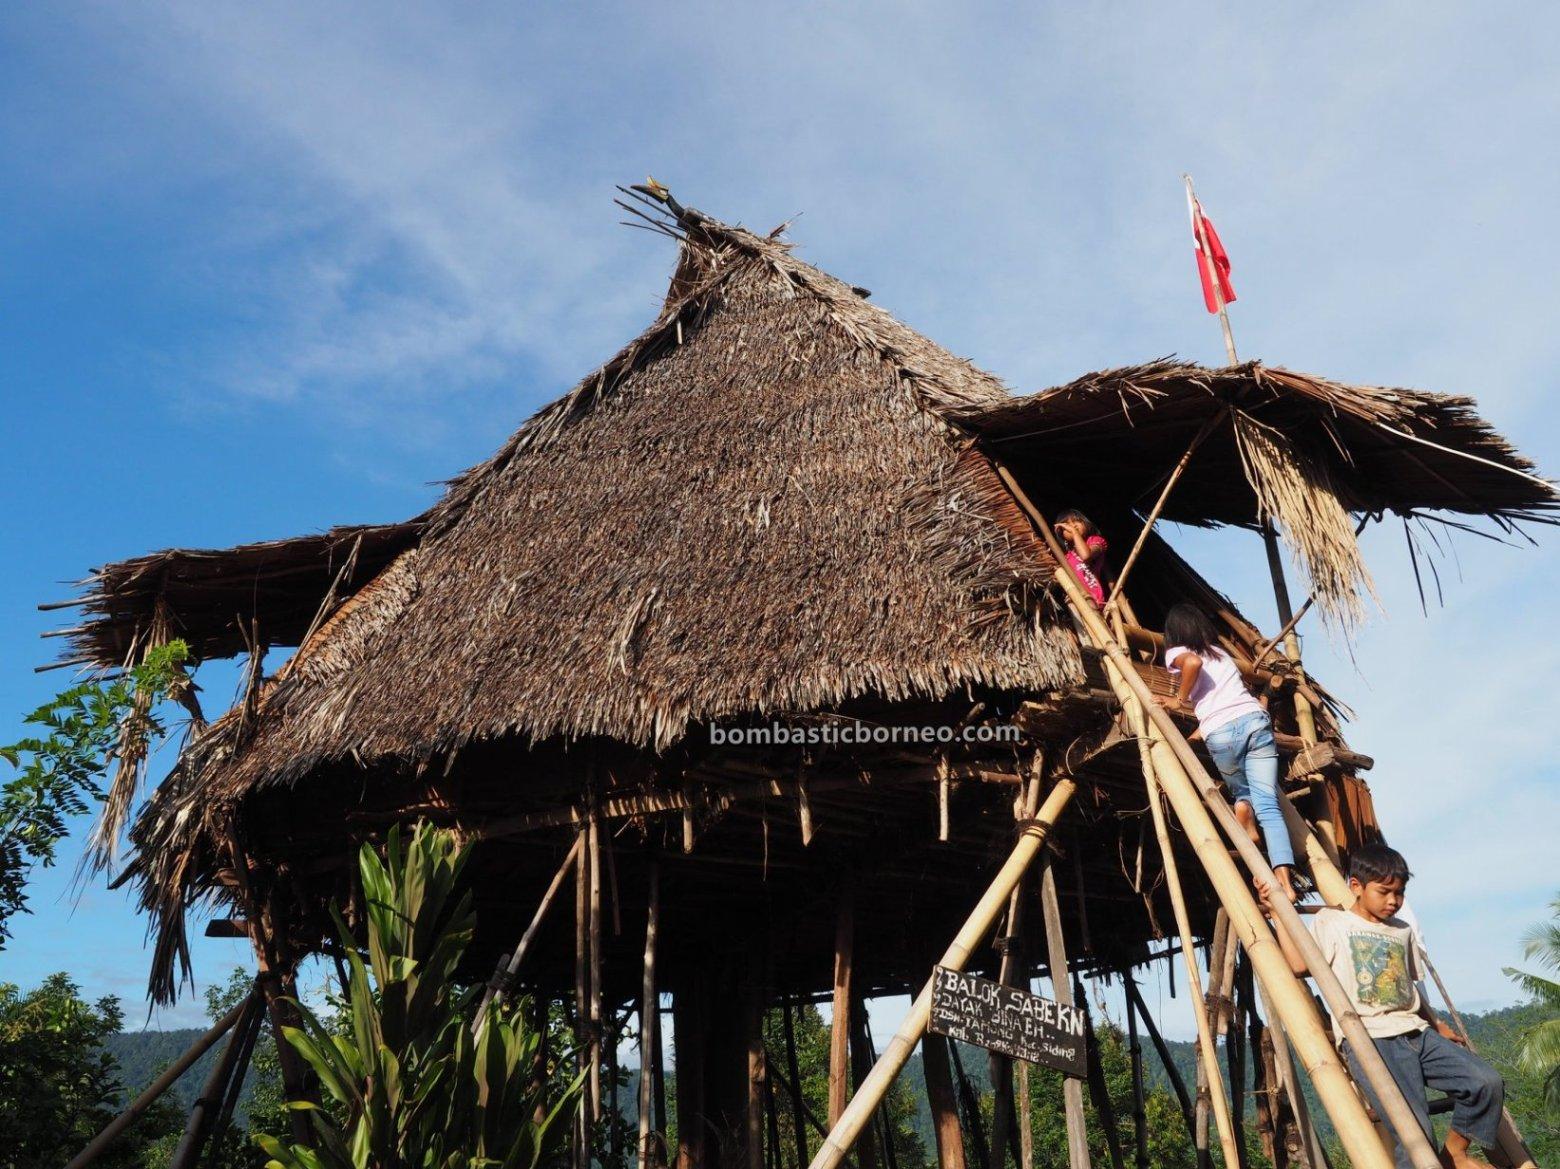 Dusun Tamong, authentic, traditional, culture, exploration, Indonesia, West Kalimantan, Bengkayang, Dayak Bidayuh, tribal, tourist attraction, travel guide, Trans Borneo, Baruk, Rumah Adat Baluk, skull house,